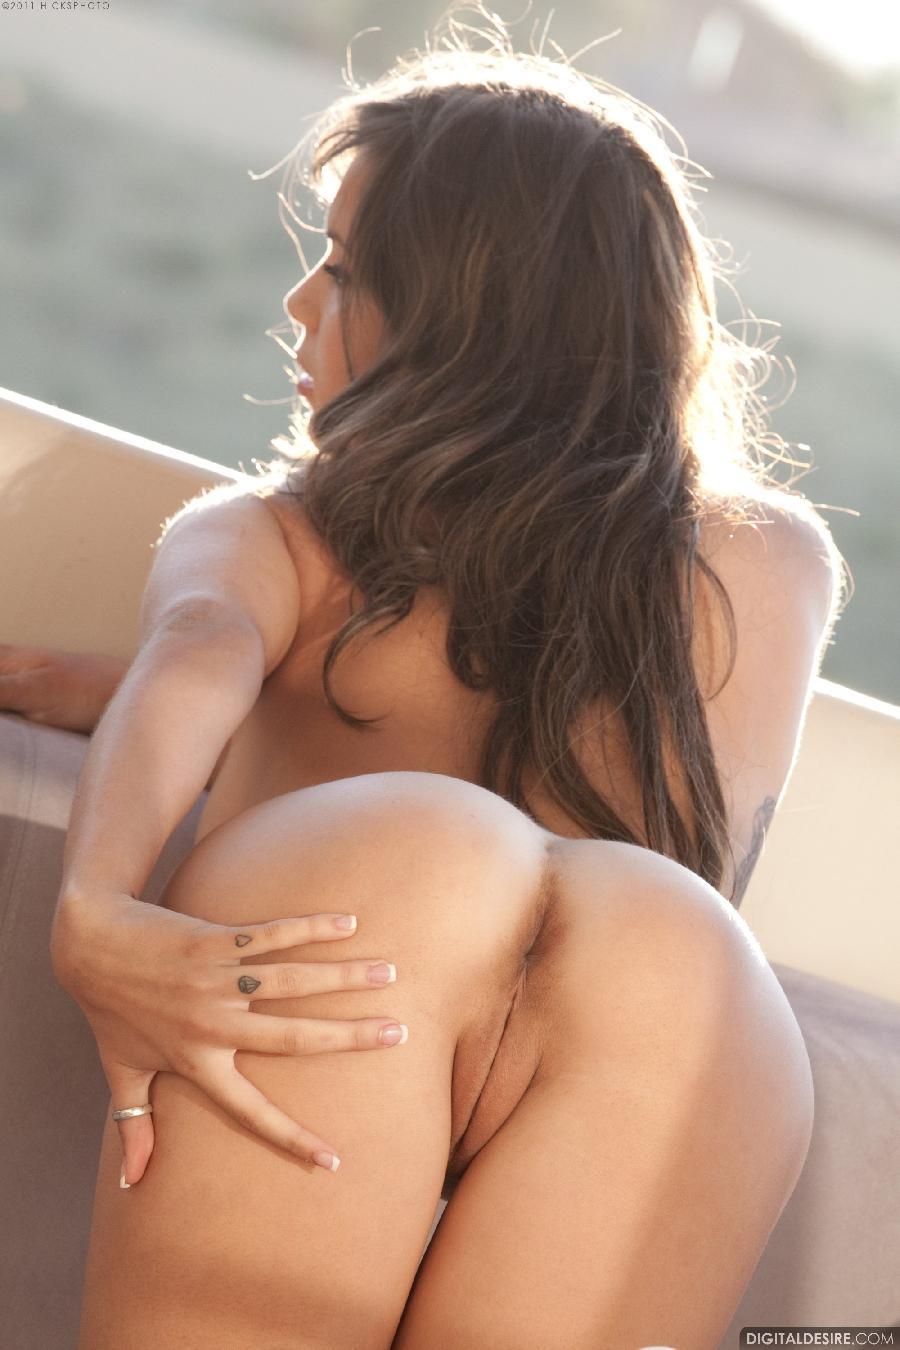 Sensual Nina James shows her tight pussy - 21